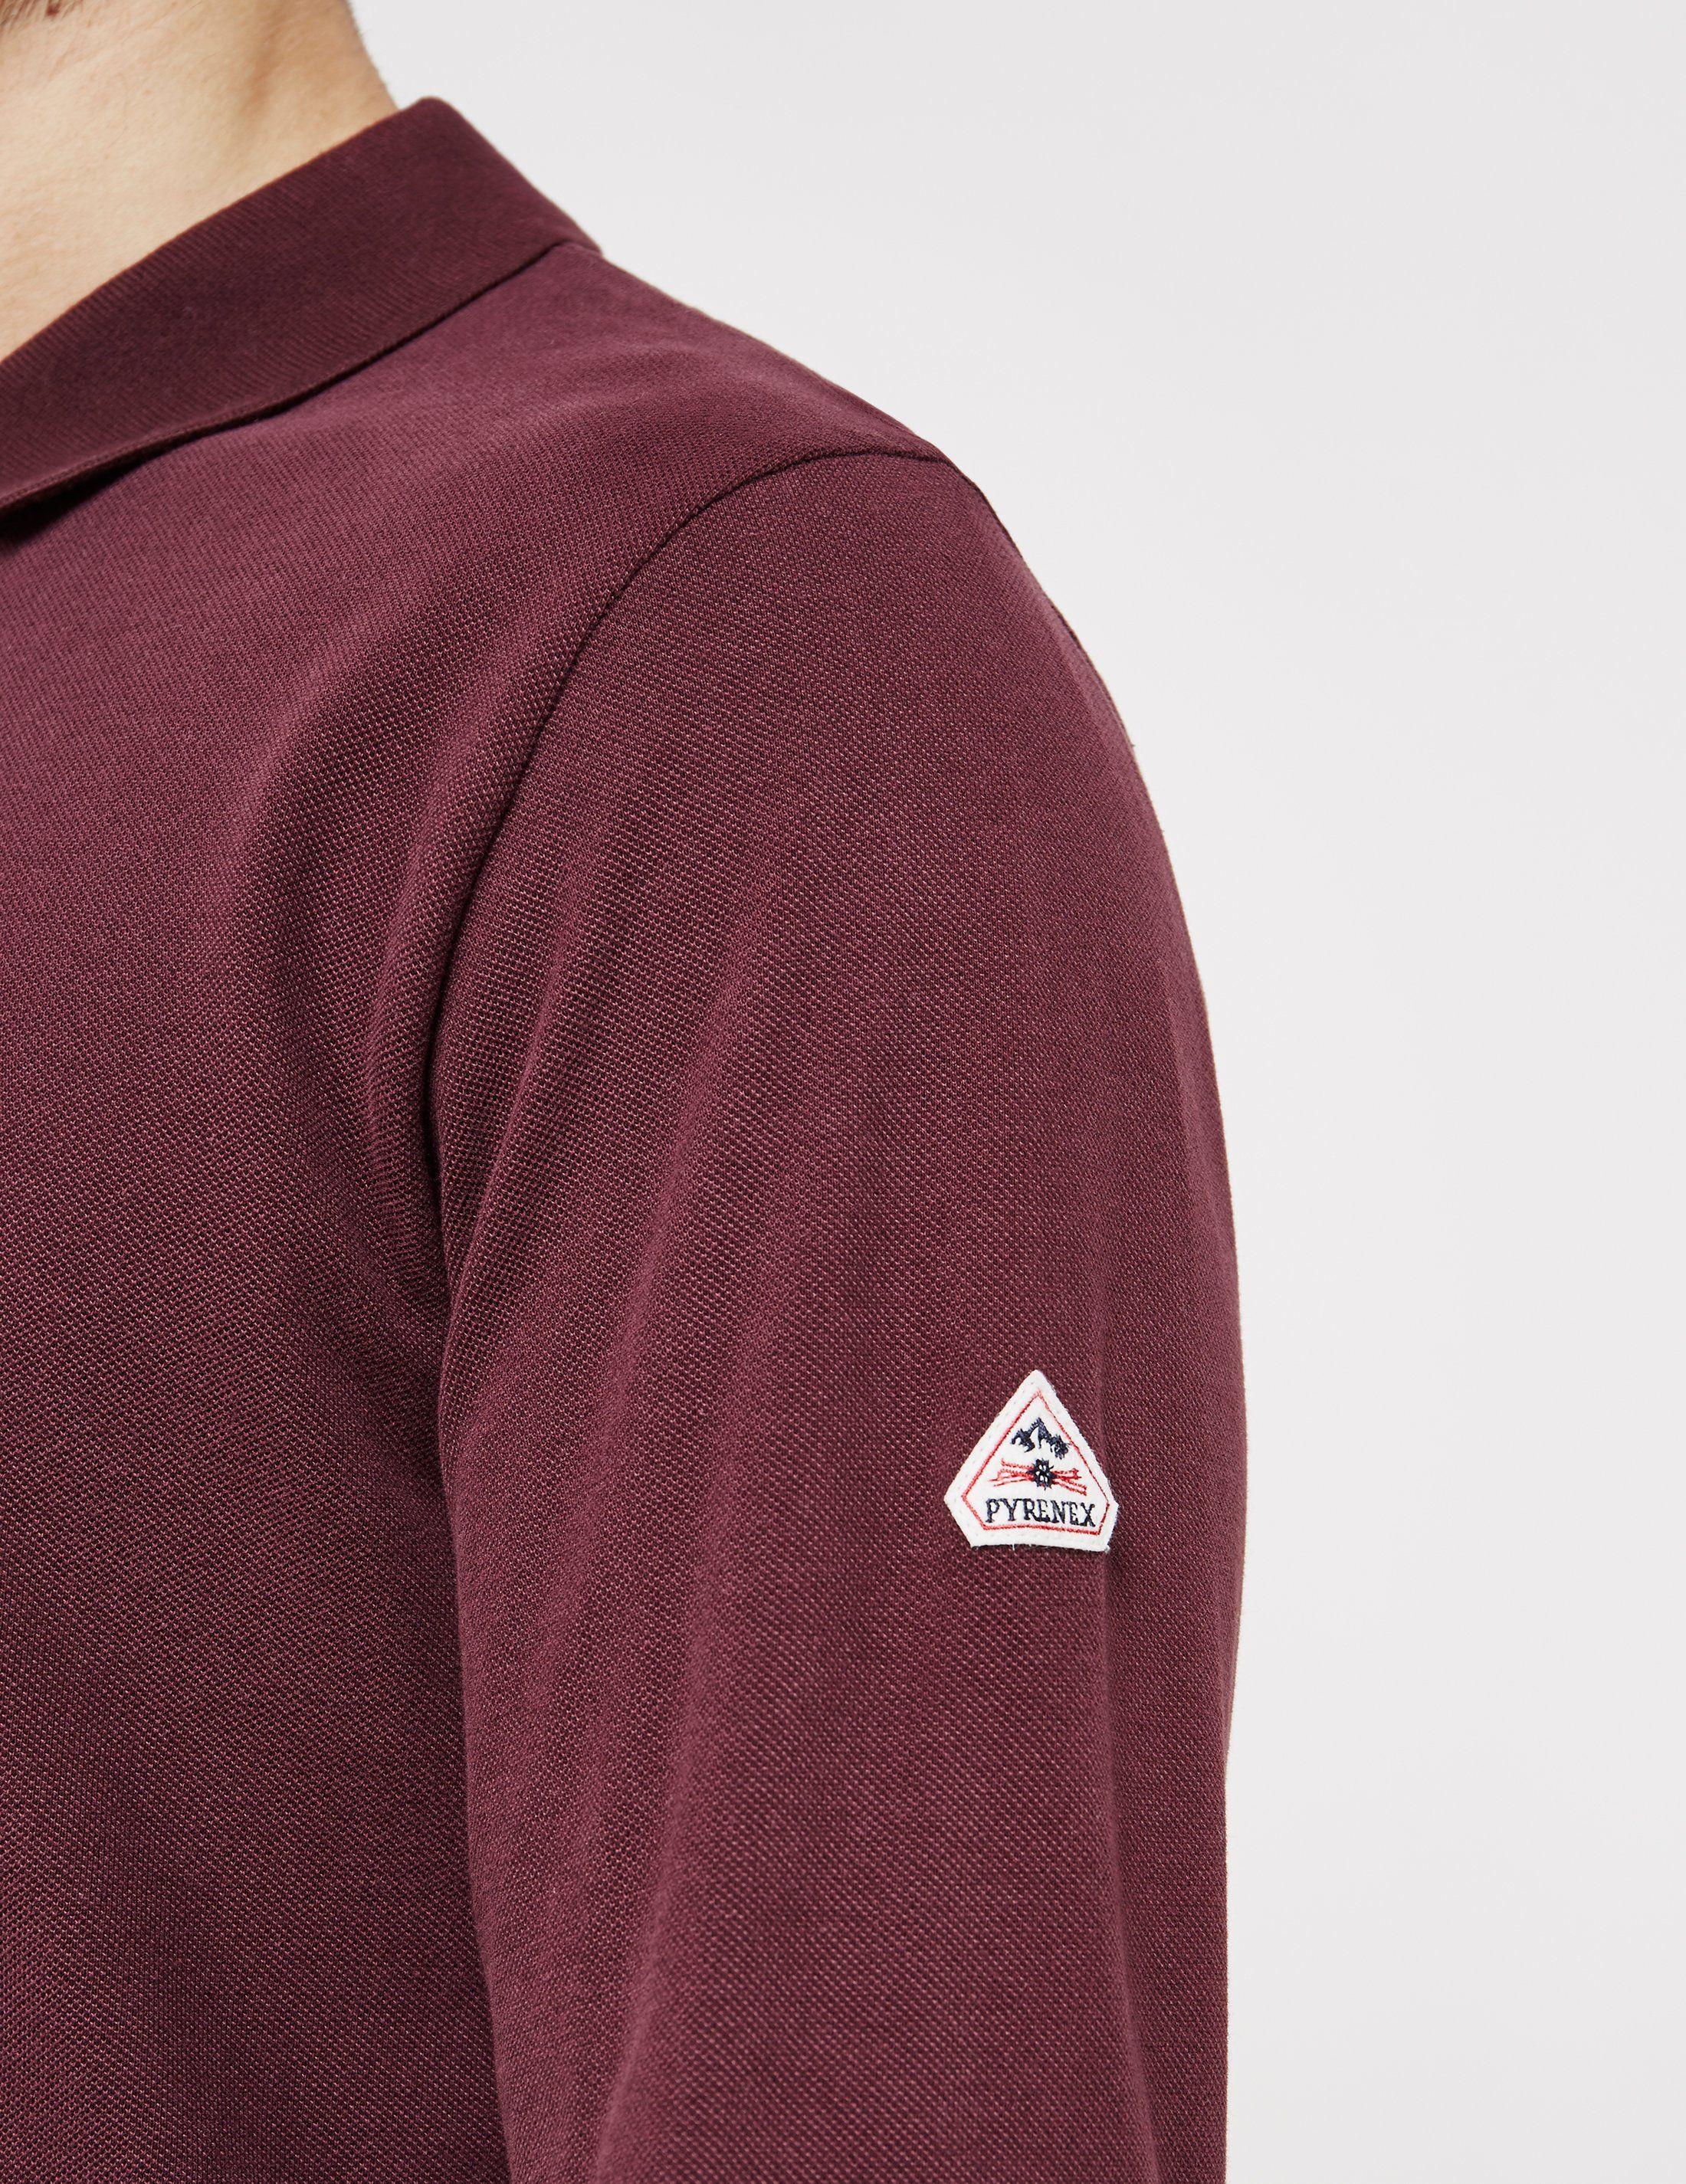 Pyrenex Laurel Long Sleeve Polo Shirt